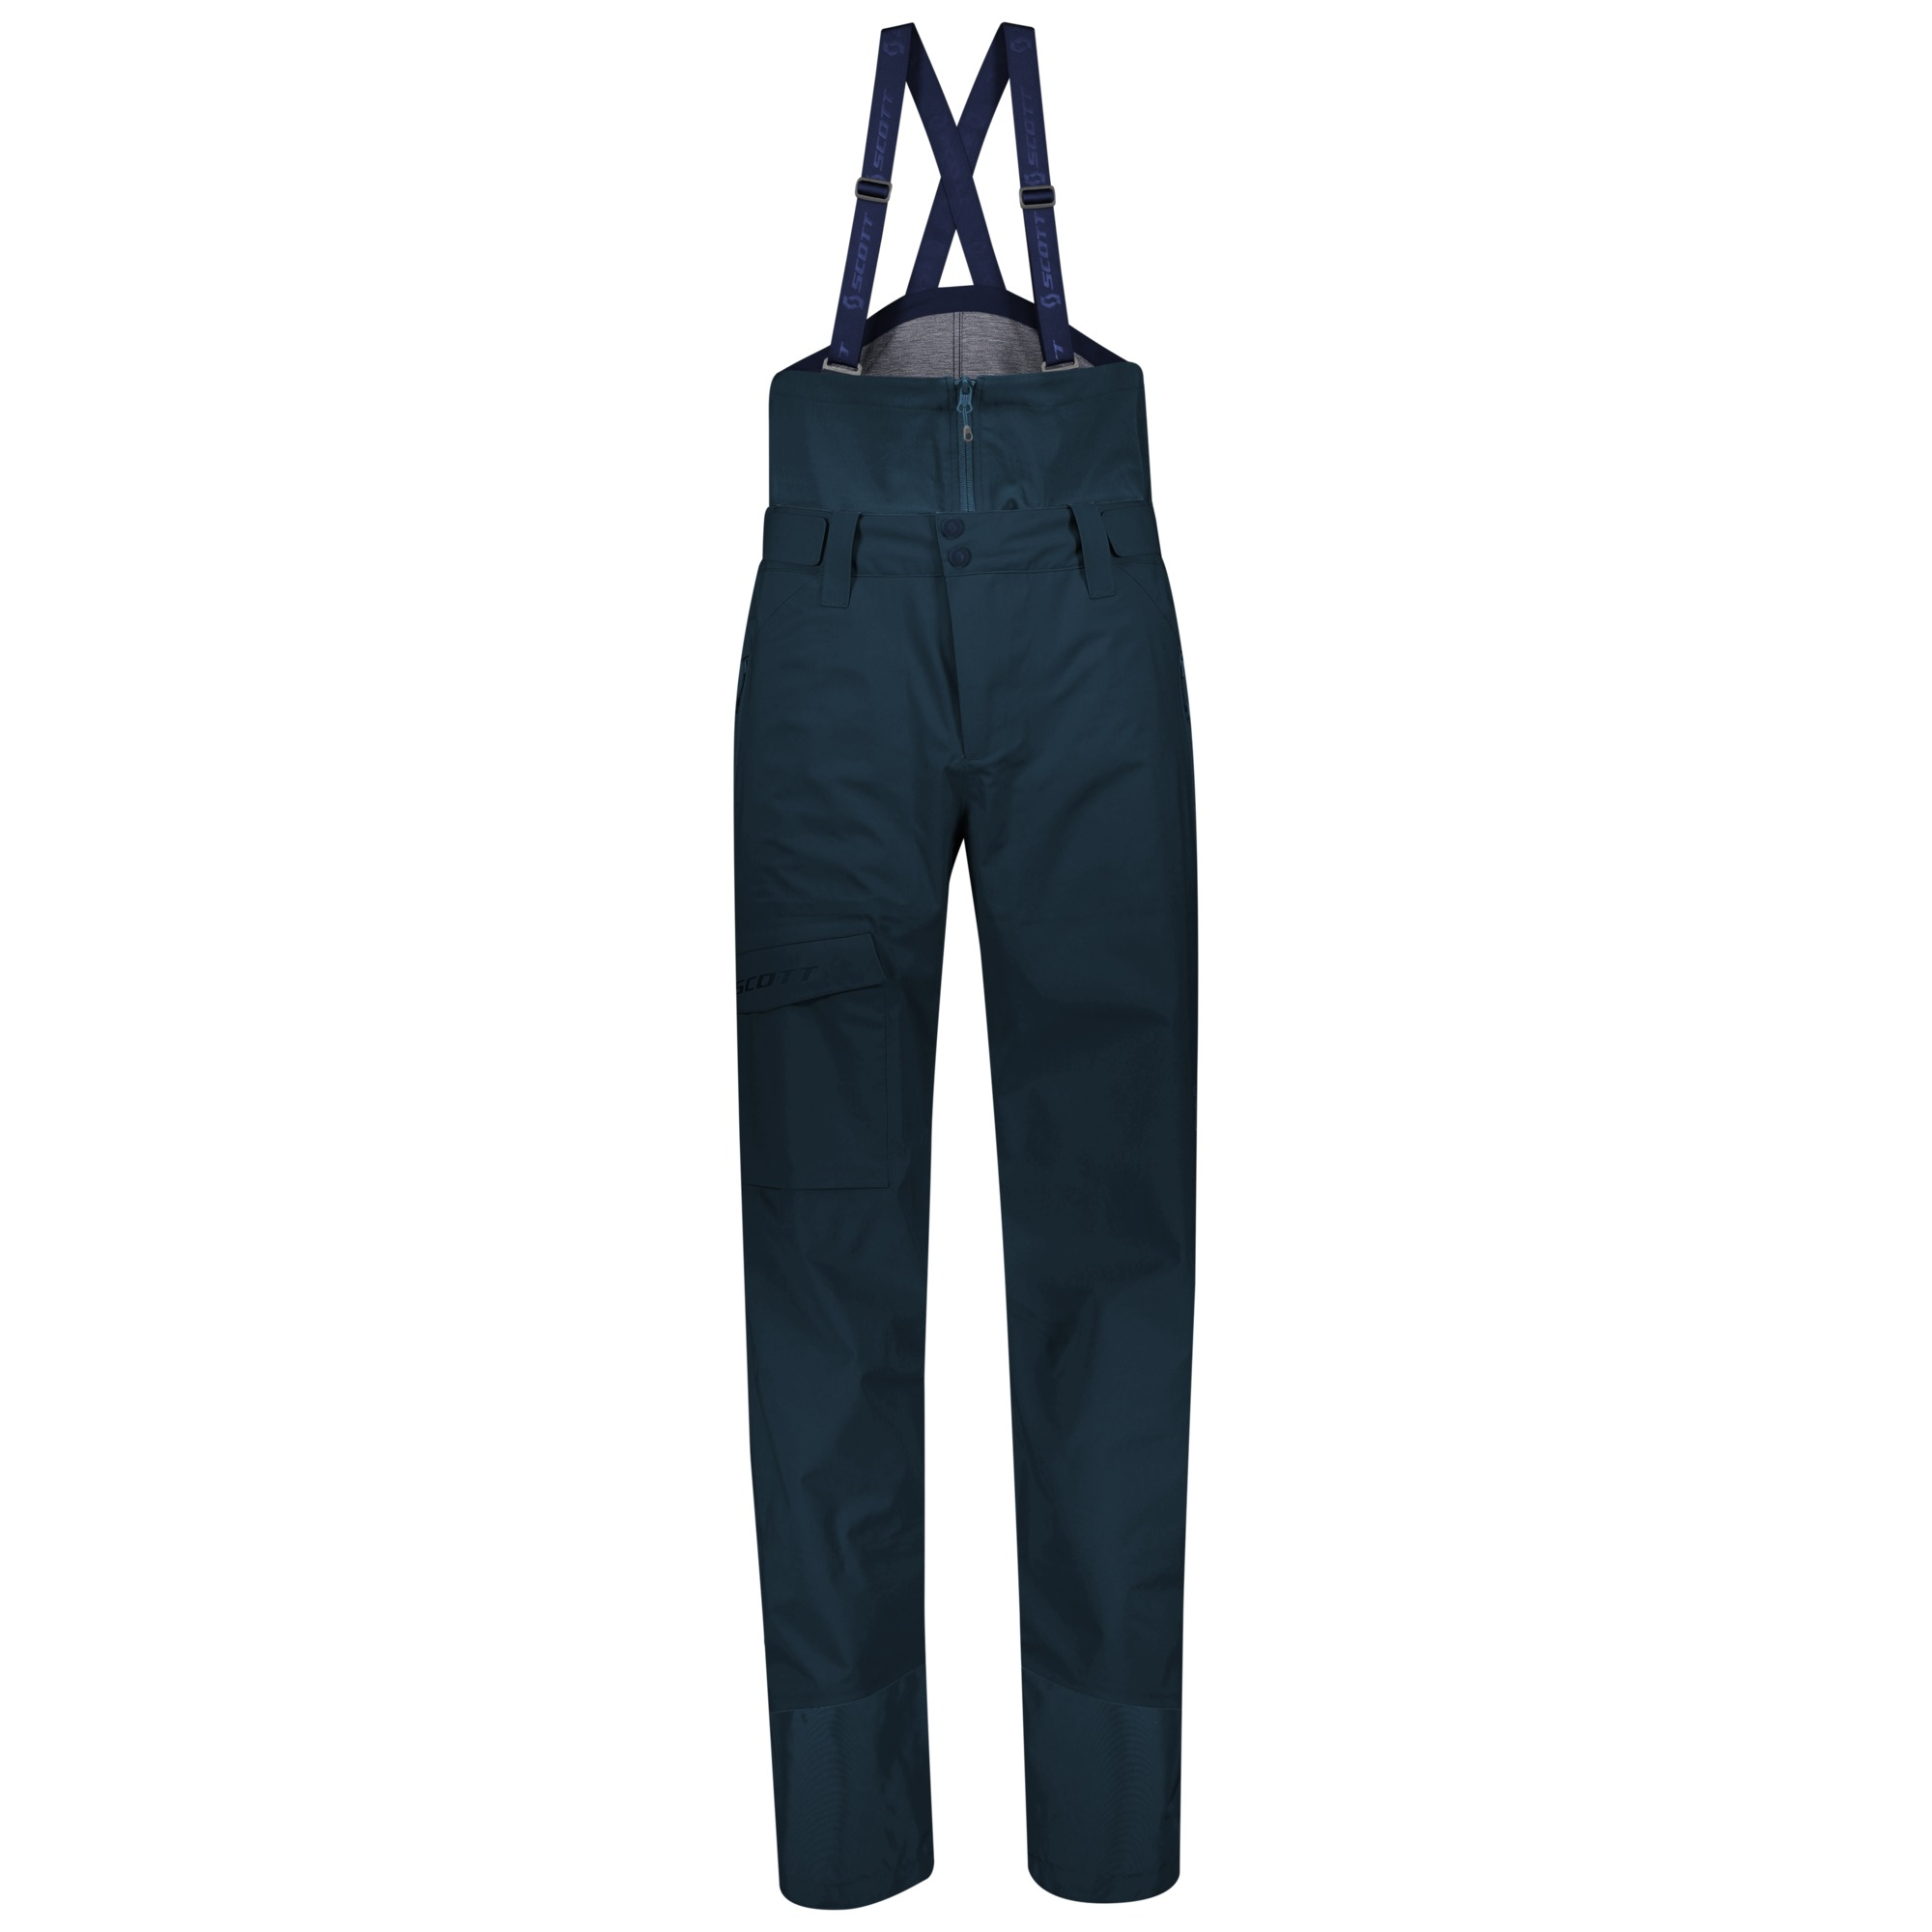 Scott Vertic 3L Pant - Ski pants - Men's